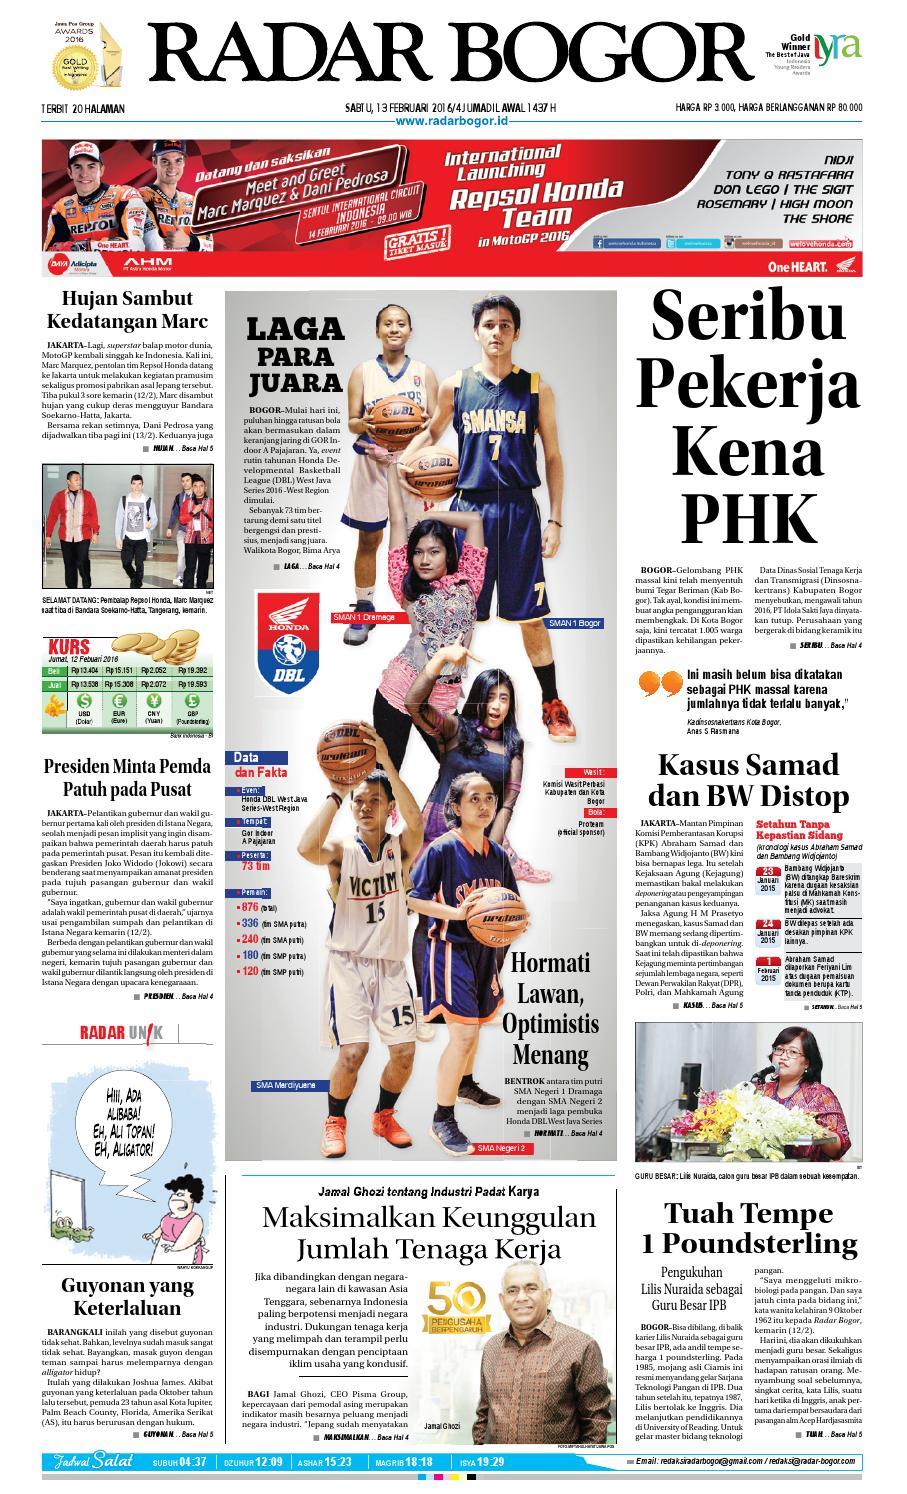 Pdf Koran Radar Bogor Tgl 13 Feb 2016 Gabung By Diaswara Rkb Bni Tegal Kranjang Buah Nur Fashion And Art Kusumawardani Issuu